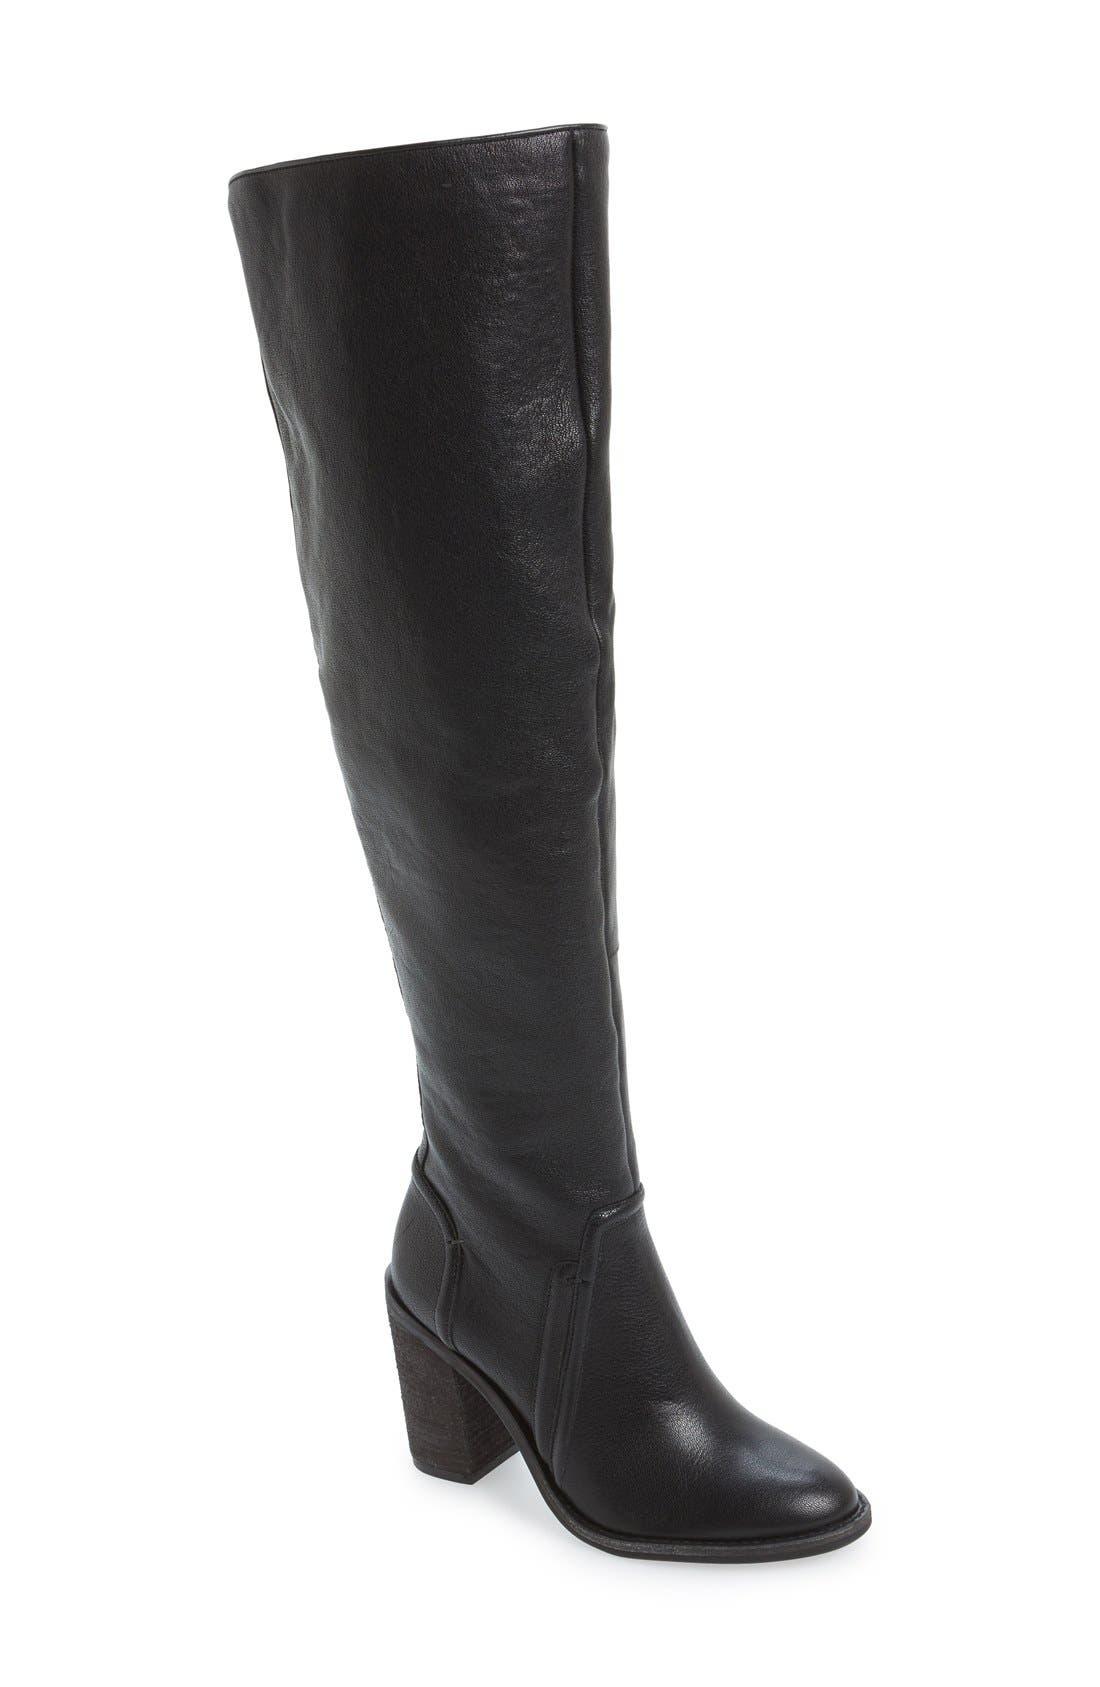 'Melaya' Over the Knee Boot,                             Main thumbnail 1, color,                             001